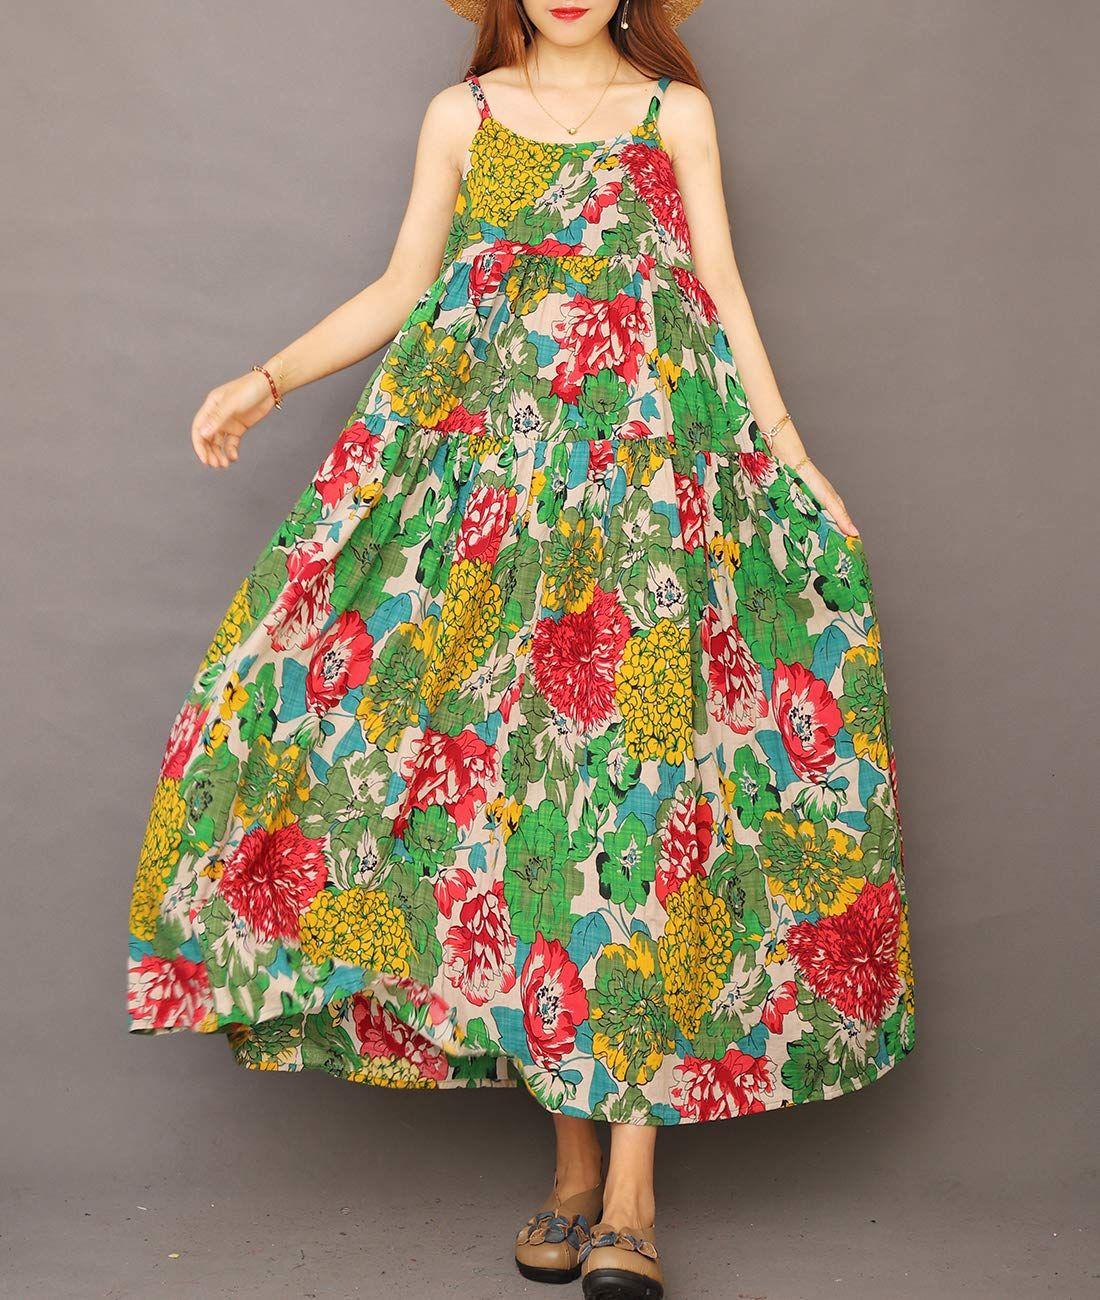 Yesno Casual Bohemian Spaghetti E75 Cr10xxl Summer Dresses For Women Beautiful Summer Dresses Long Maxi [ 1300 x 1100 Pixel ]